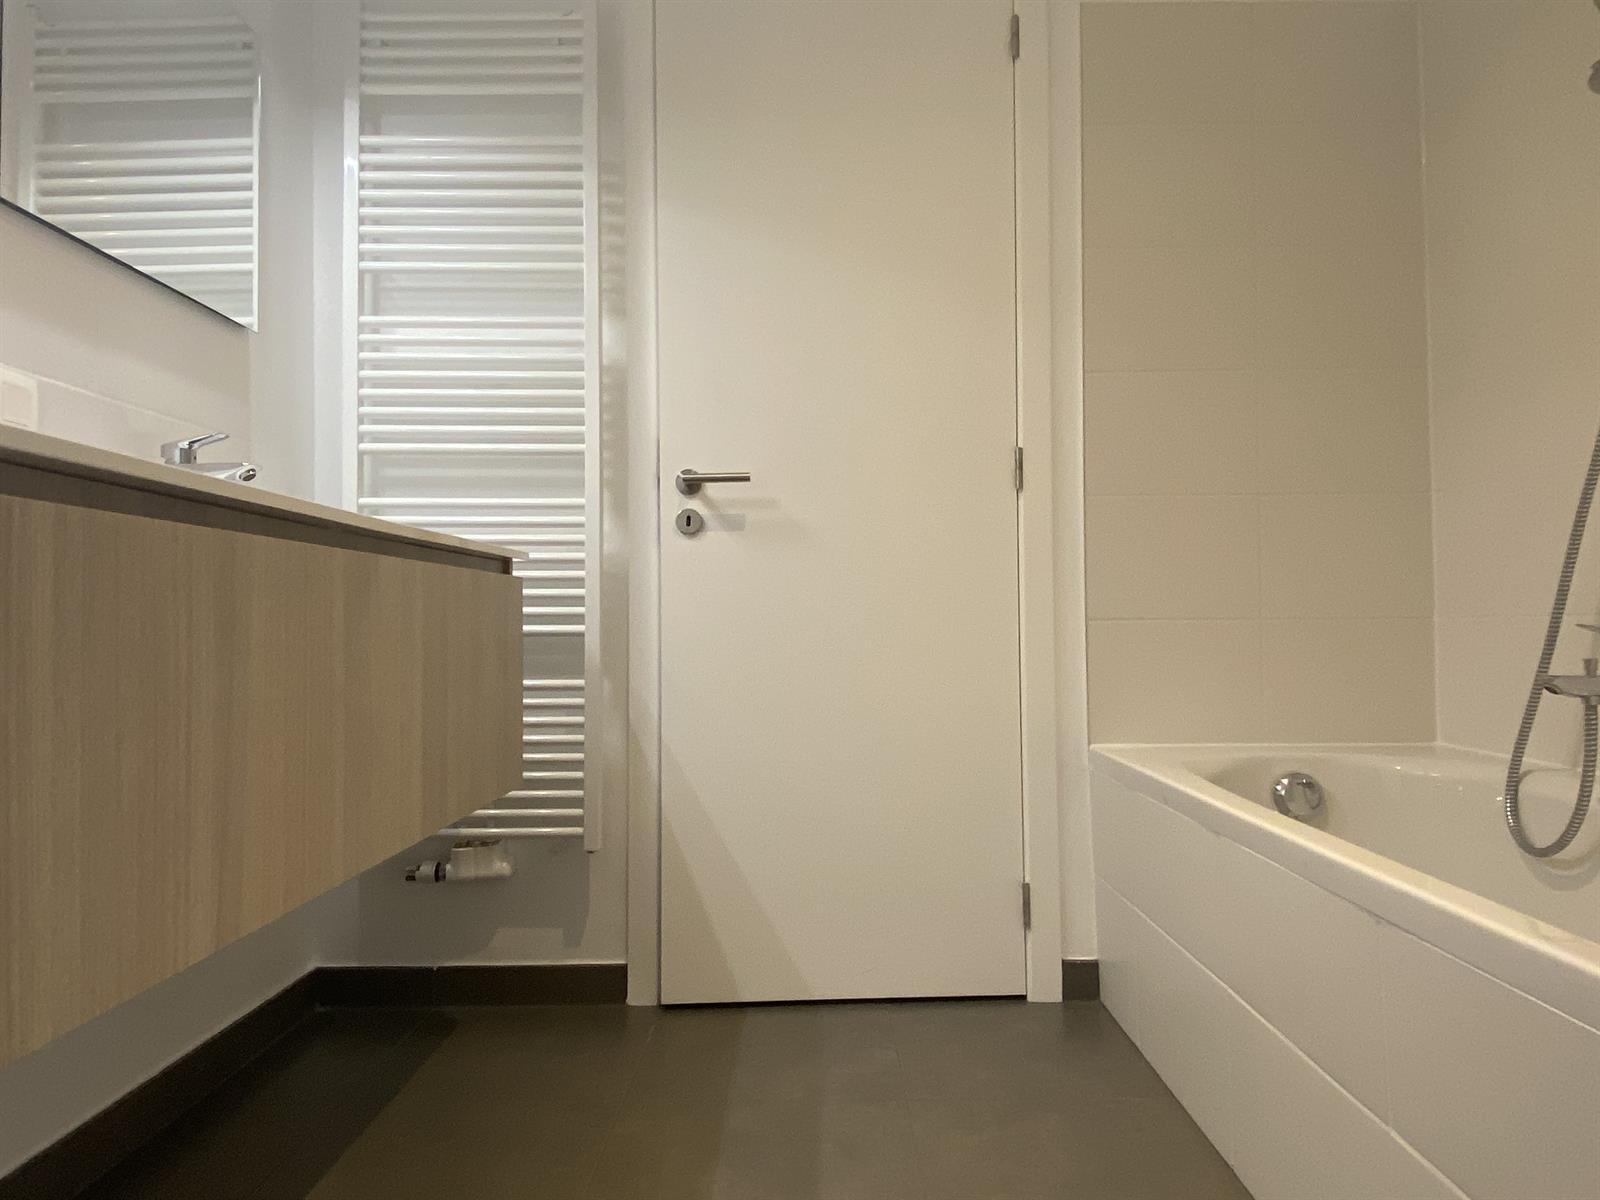 Appartement - Woluwe-Saint-Lambert - #4455478-4